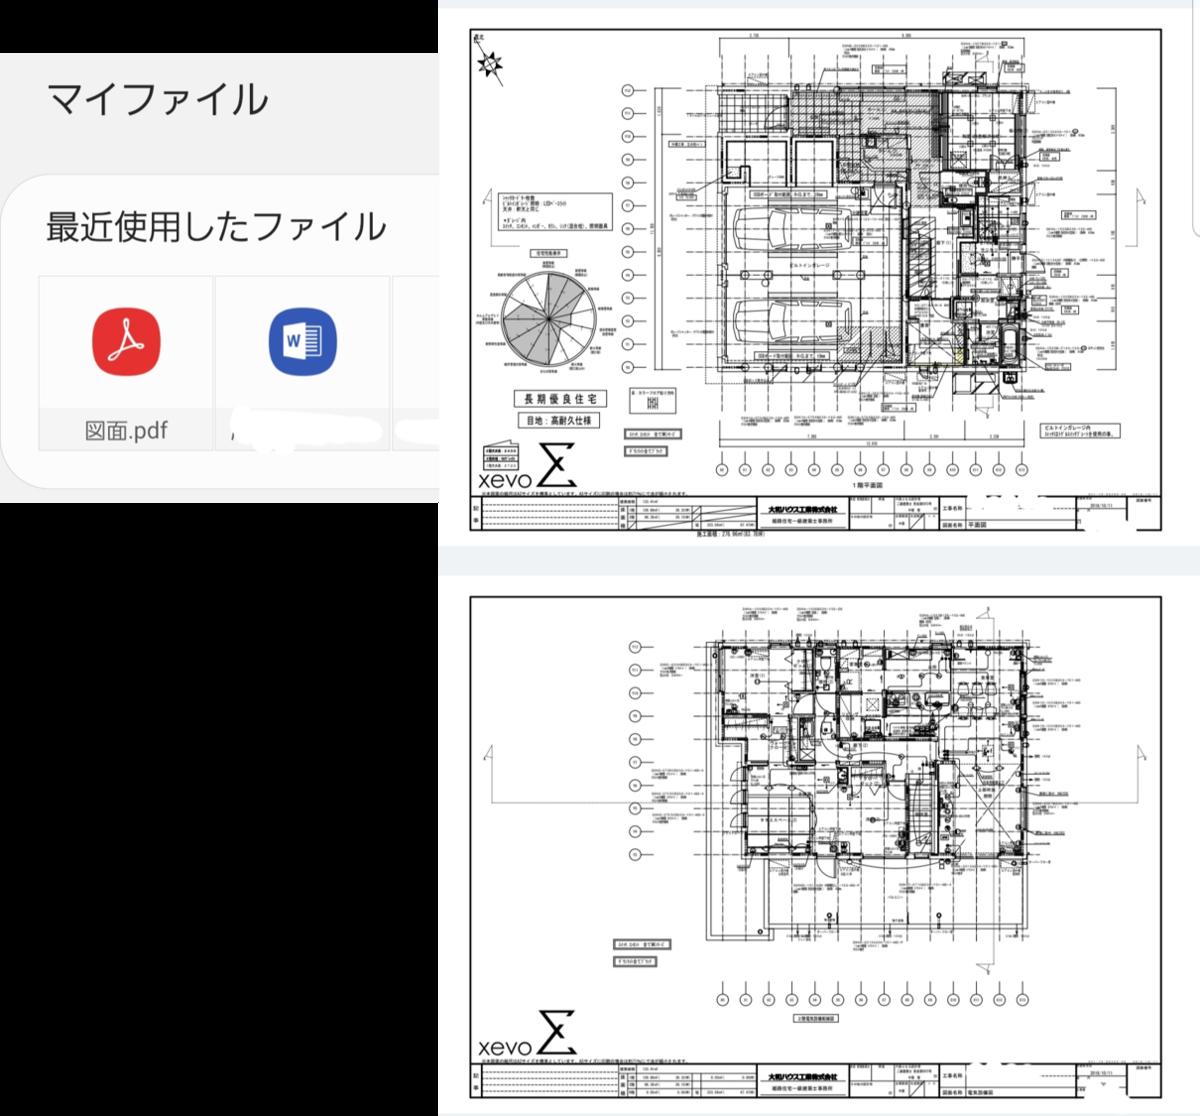 f:id:omsin:20190717135020p:plain